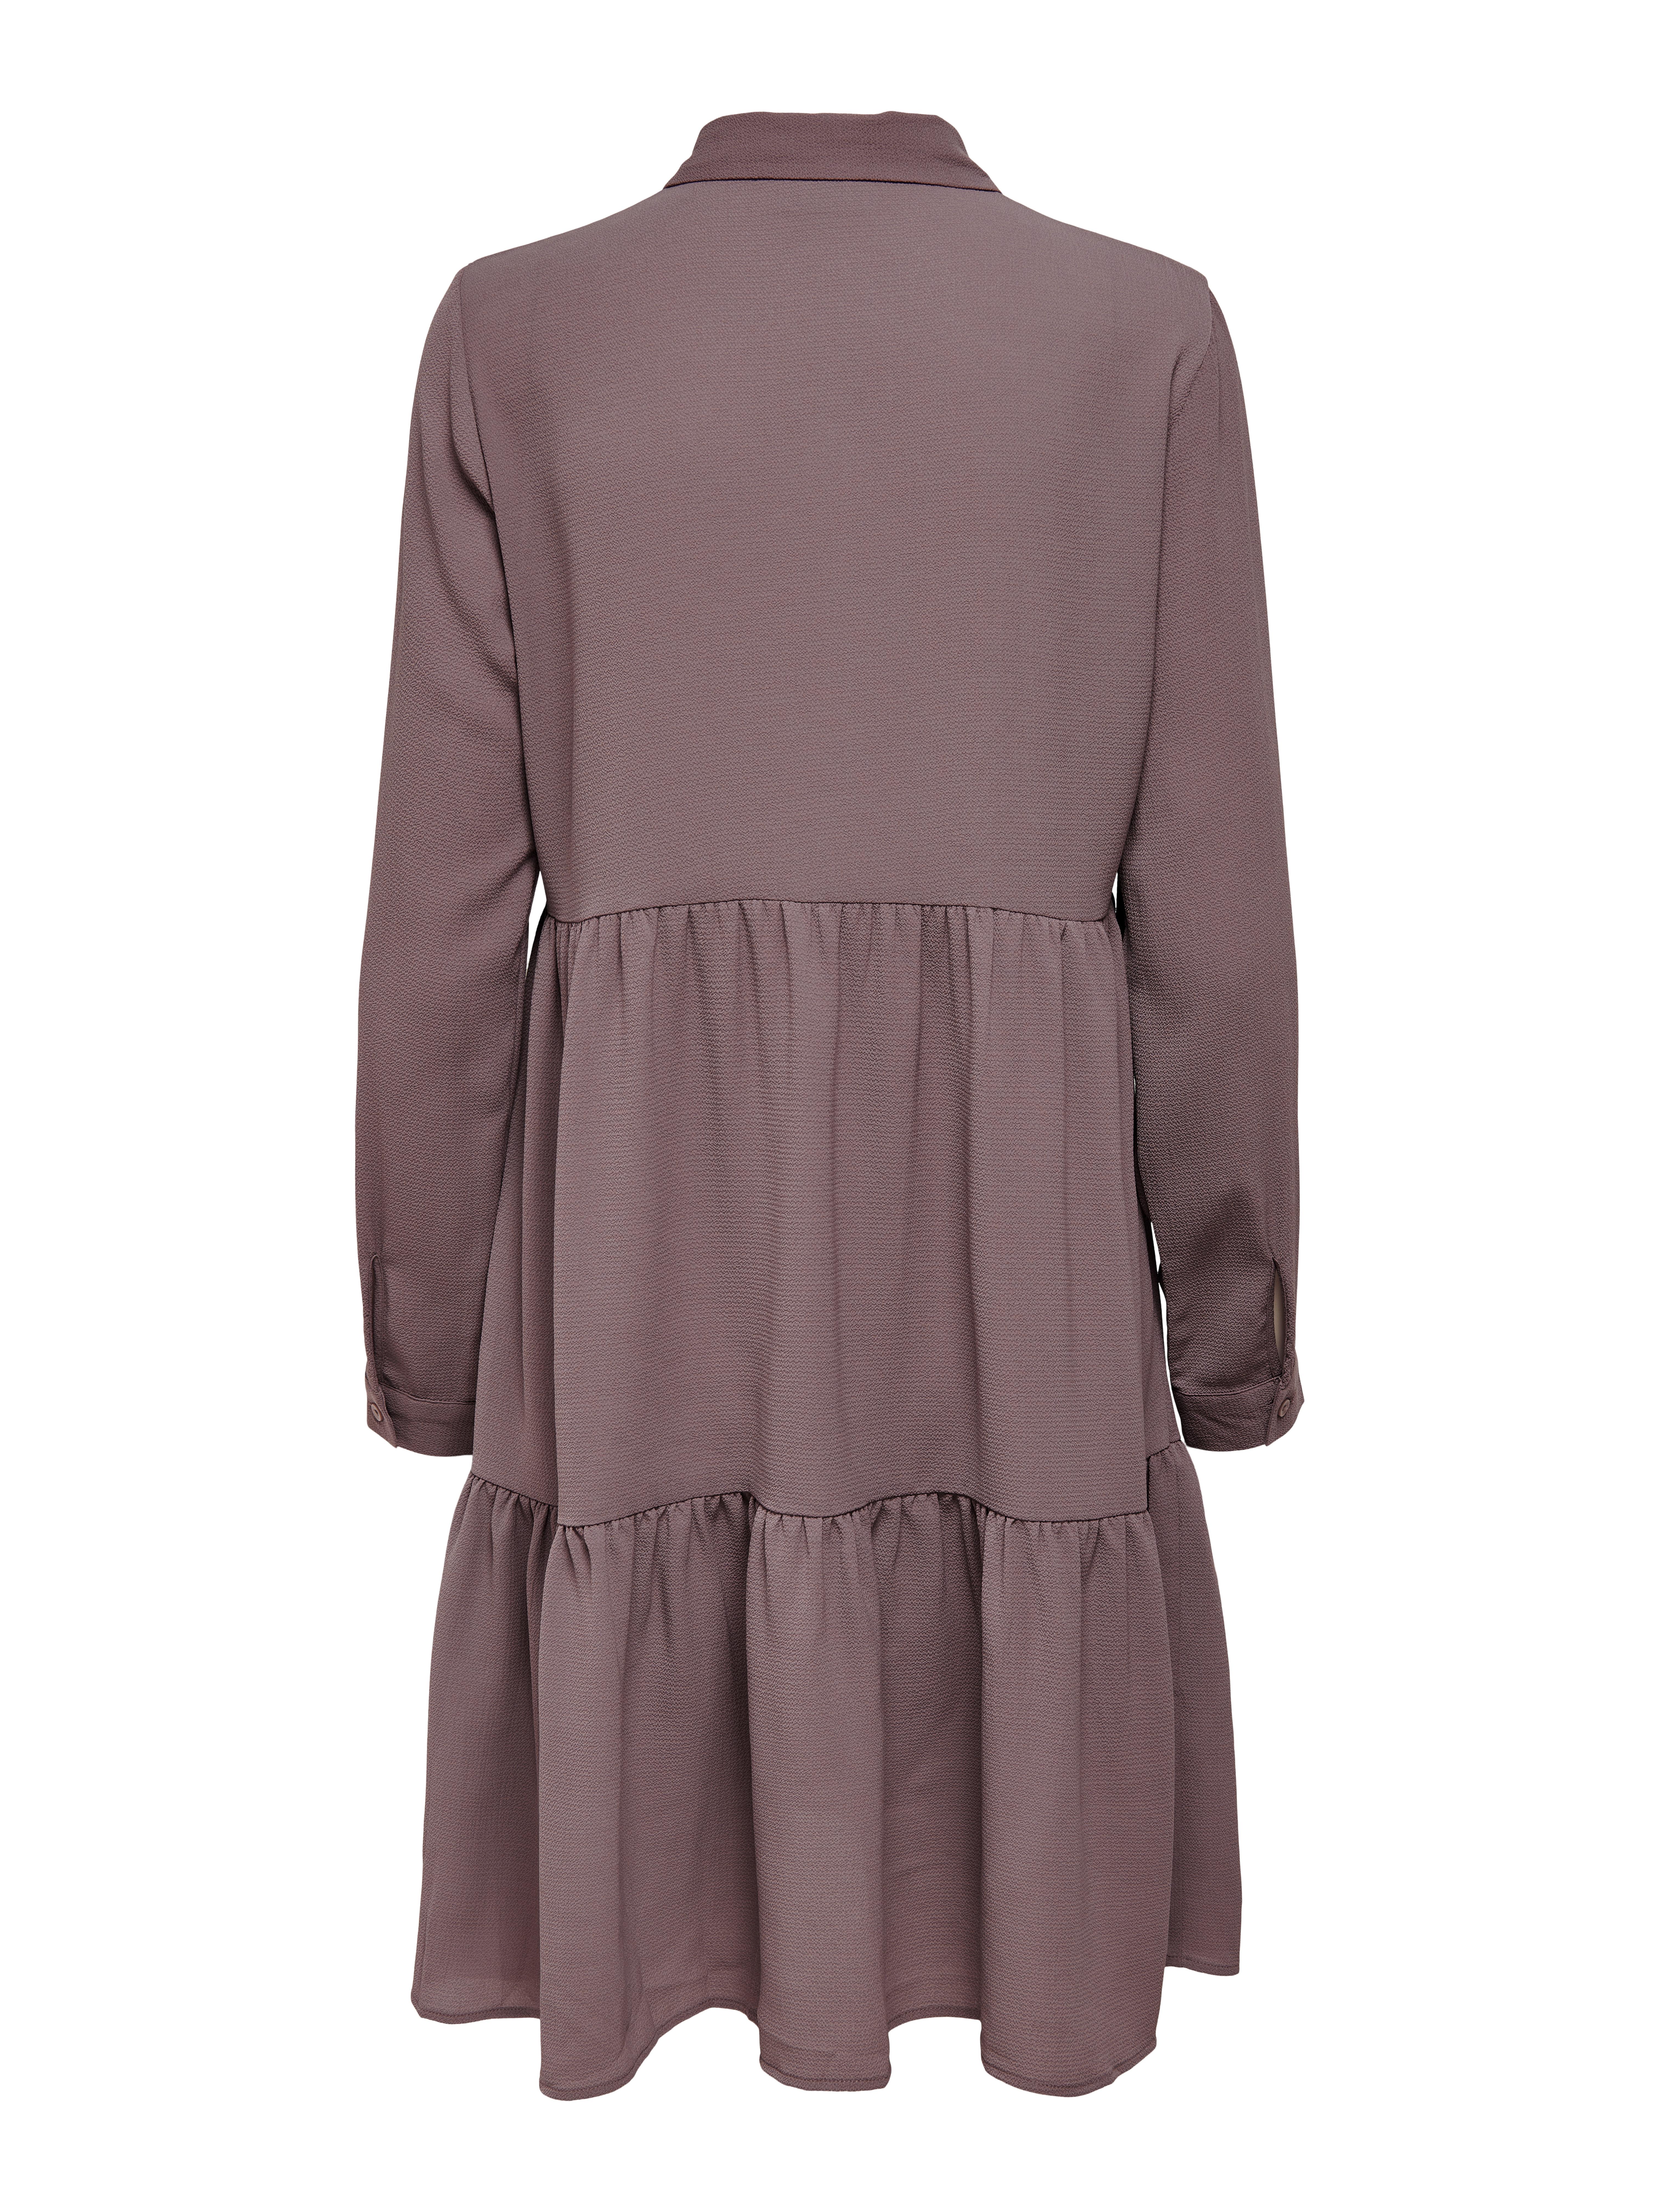 Jacqueline de Yong Piper skjortekjole, Rose Taupe, 42